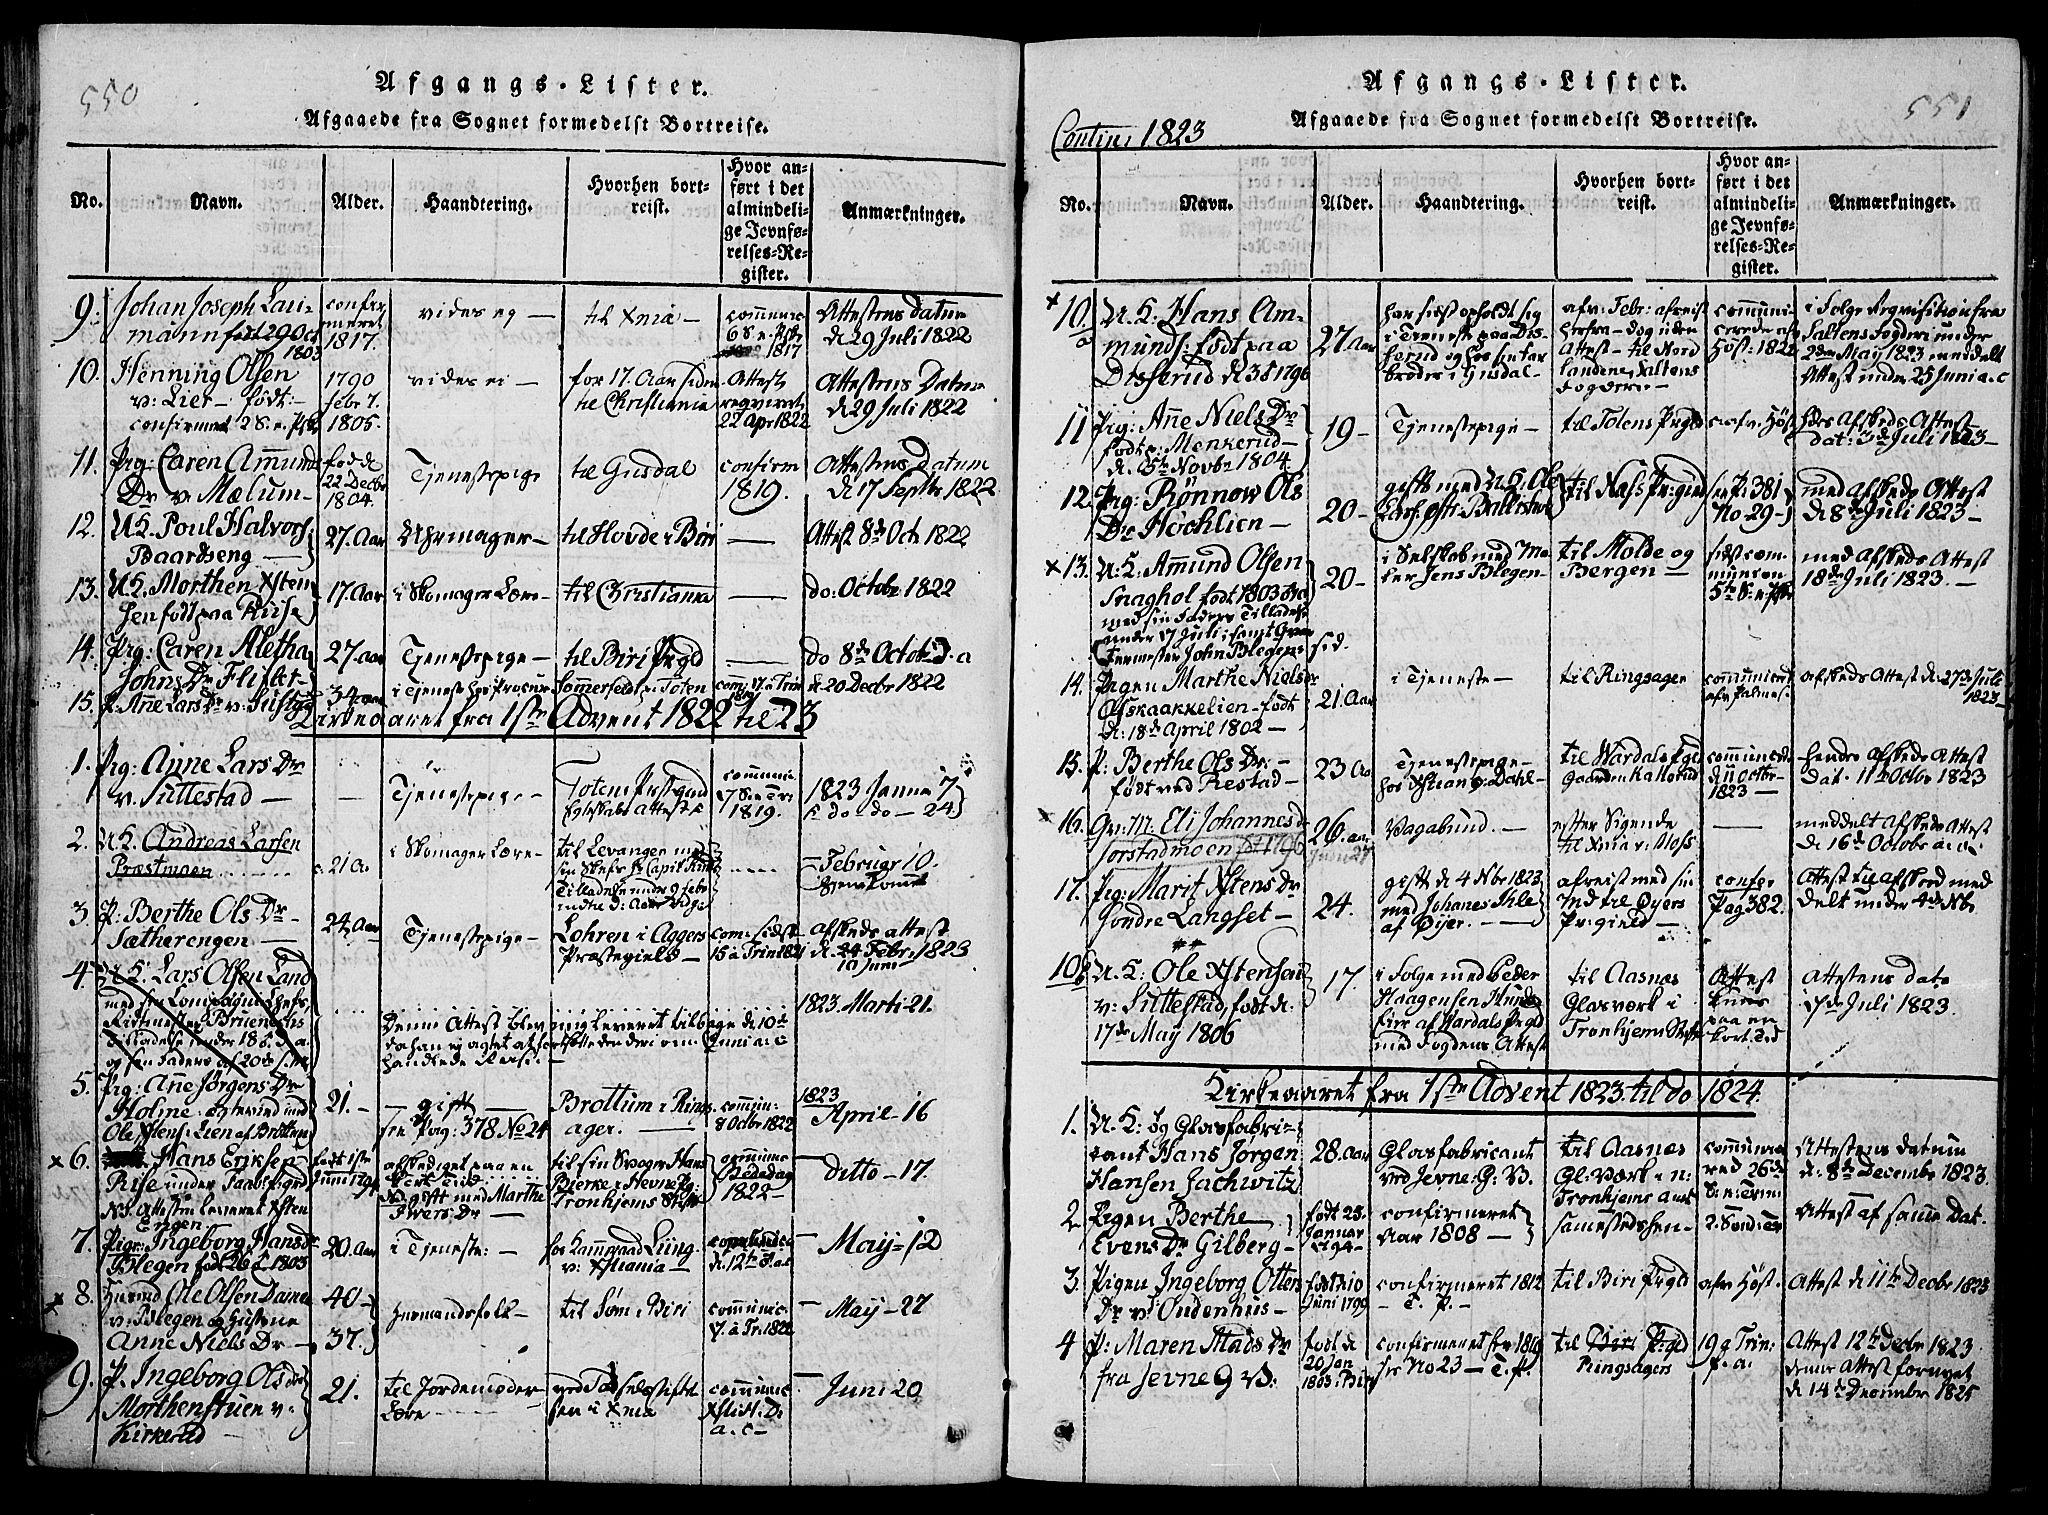 SAH, Fåberg prestekontor, Ministerialbok nr. 3, 1818-1833, s. 550-551